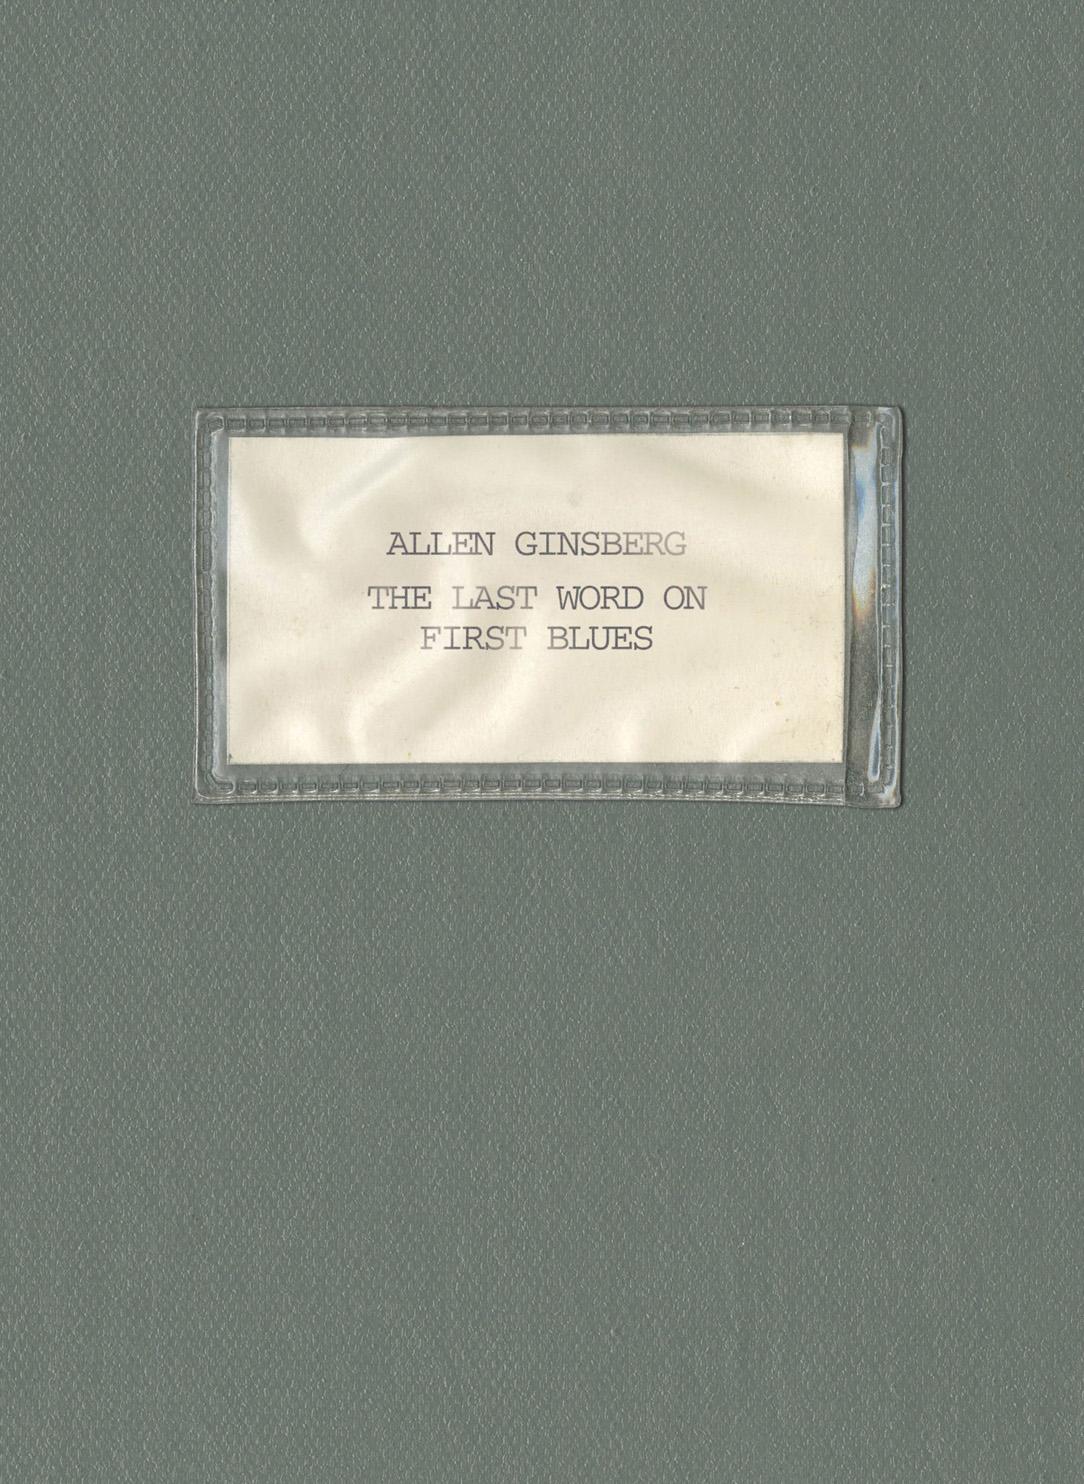 Allen Ginsberg-The Last Word On First Blues  Release Date: May 20, 2016 Label: Omnivore Recordings  SERVICE: Restoration, Mastering NUMBER OF DISCS: 3 GENRE: Folkrock FORMAT: CD